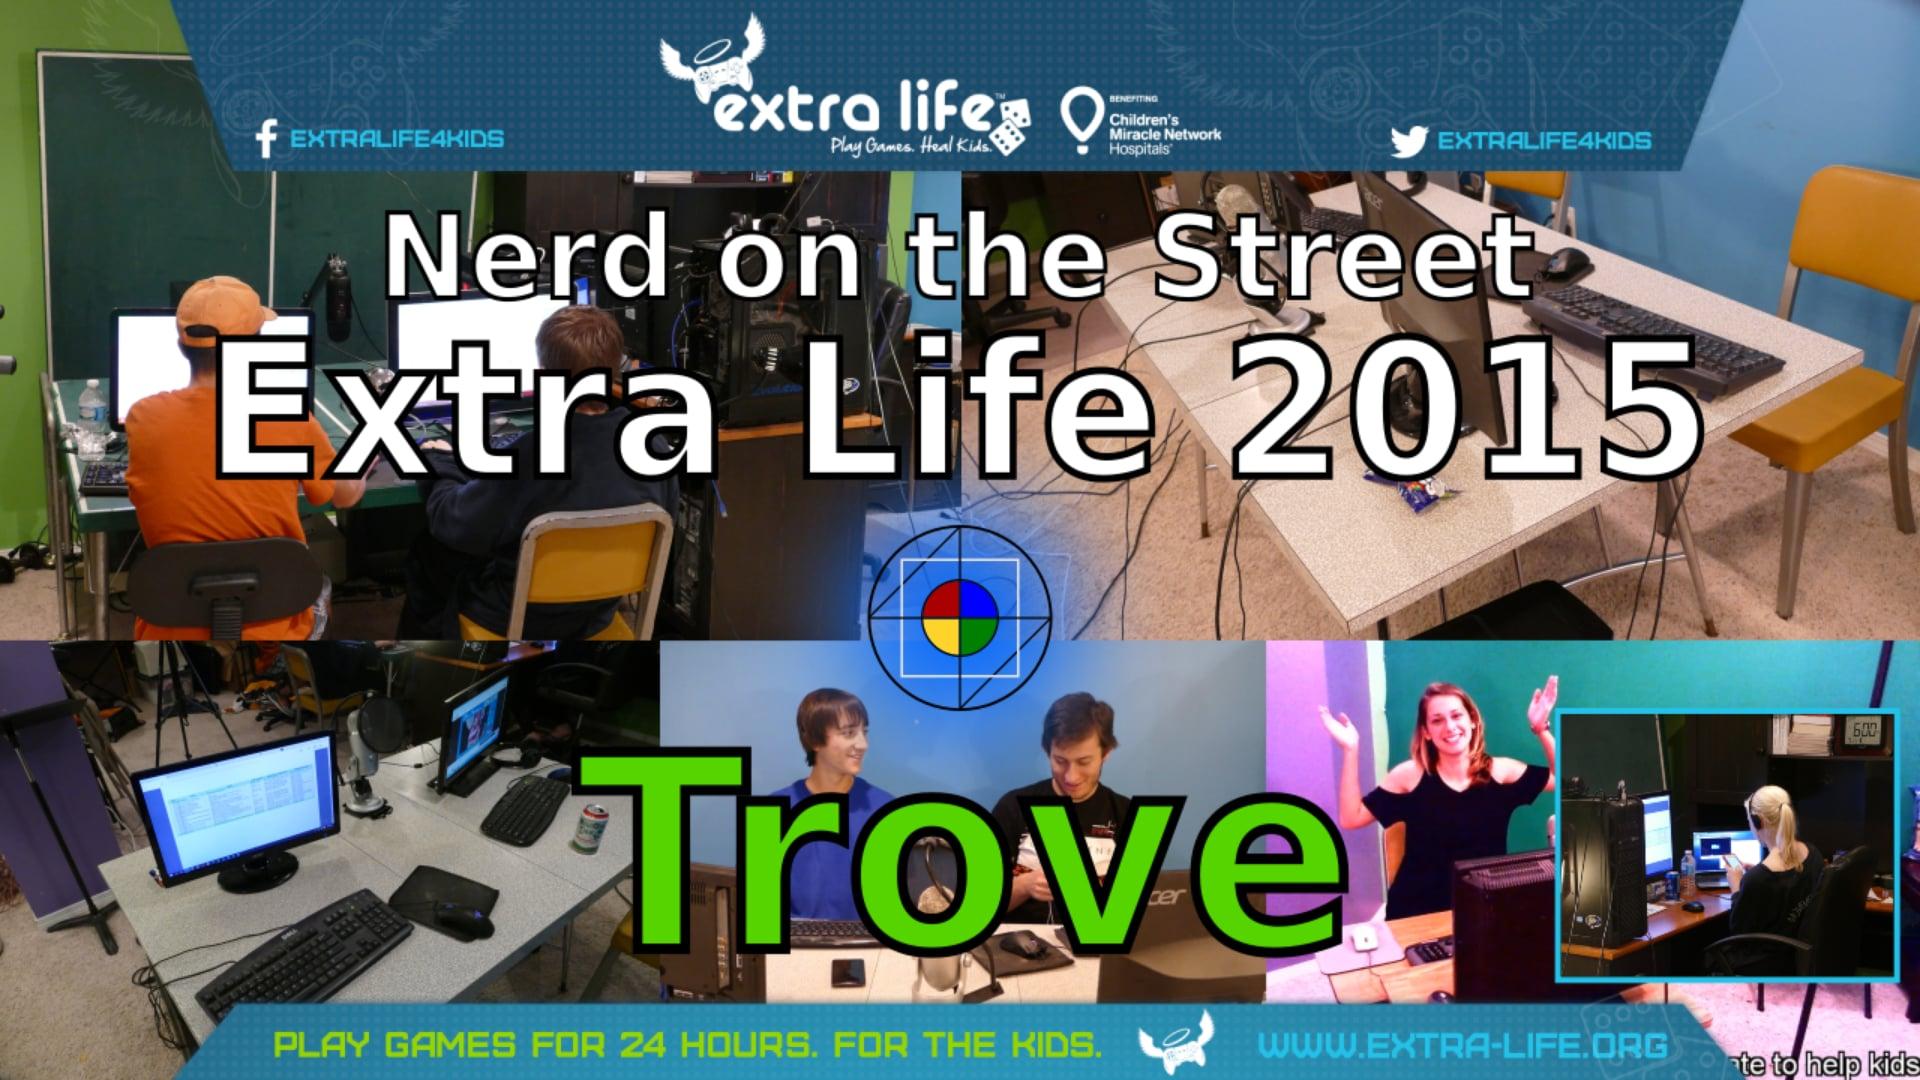 Trove - Extra Life 2015